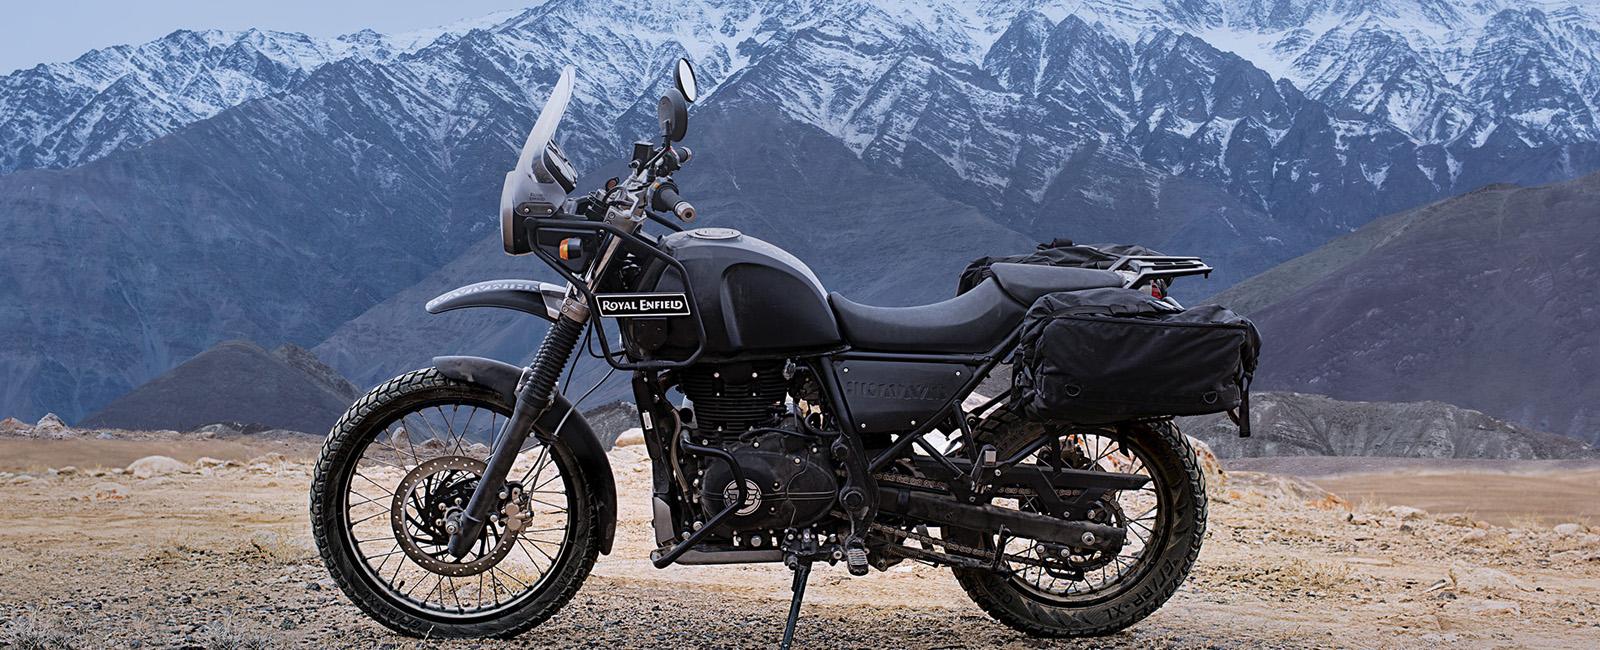 Udaipur-Bike-Rentals